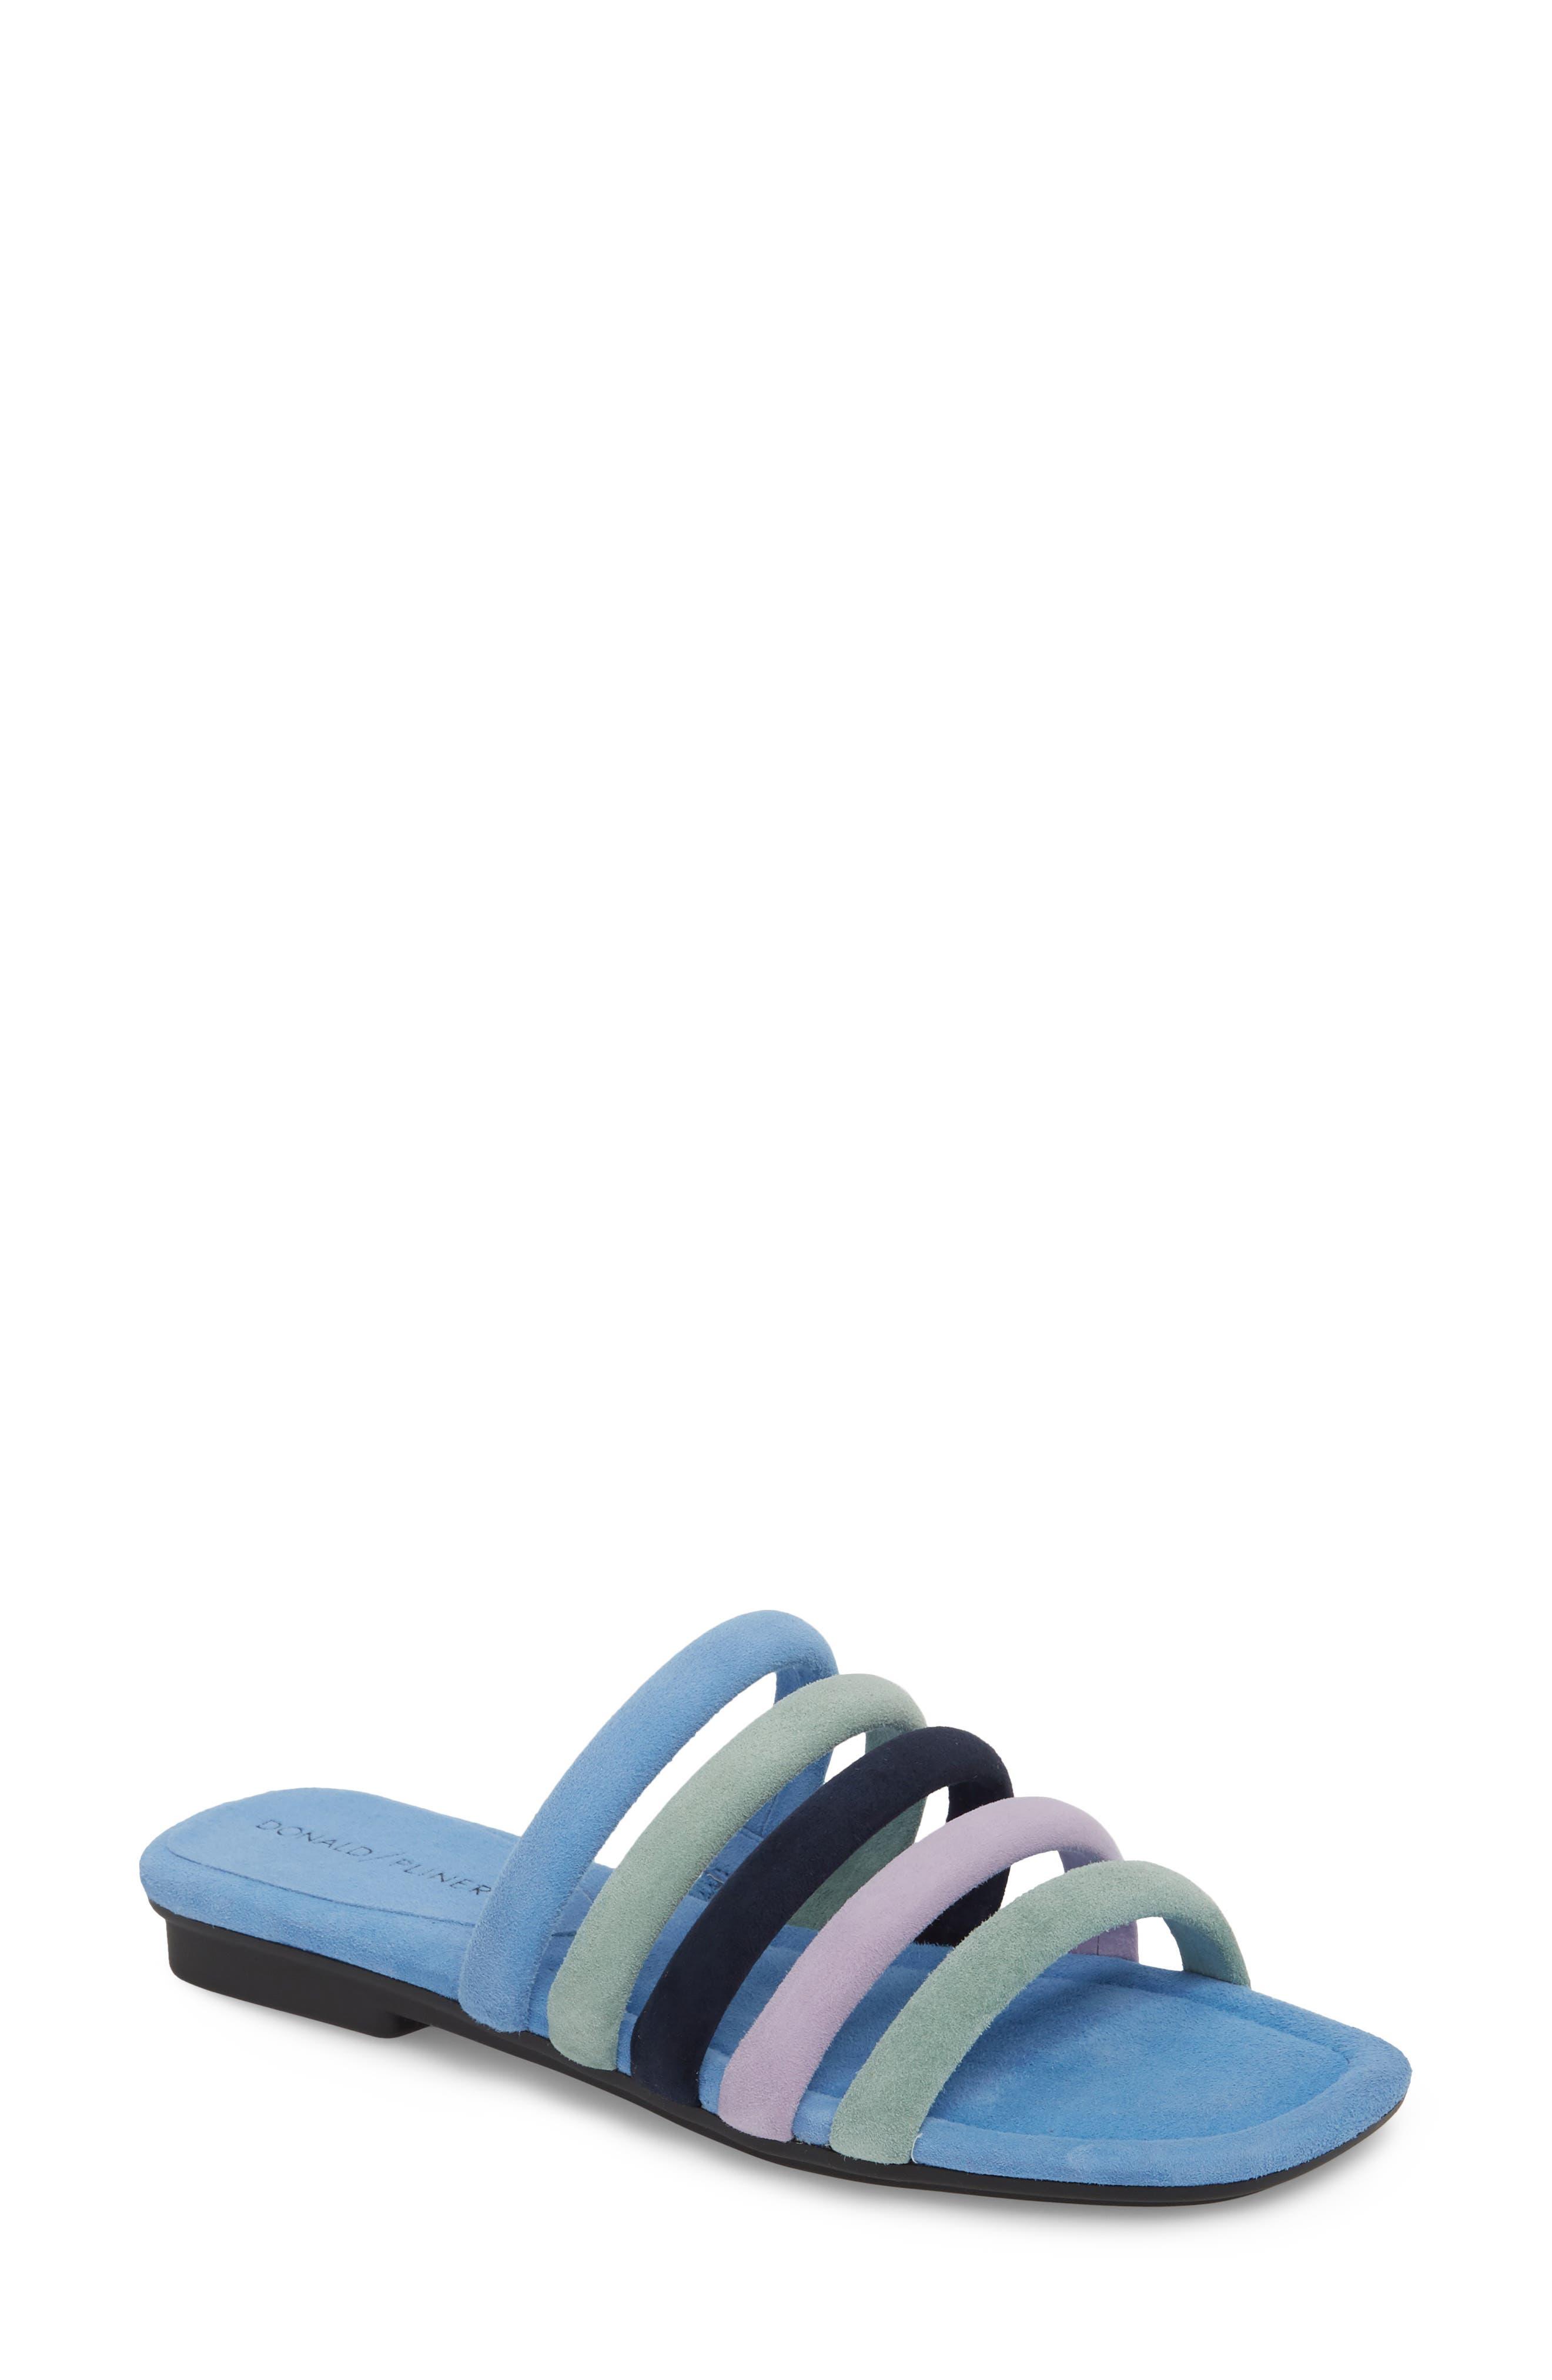 Kip Slide Sandal,                             Main thumbnail 1, color,                             Sage/ Blue Leather